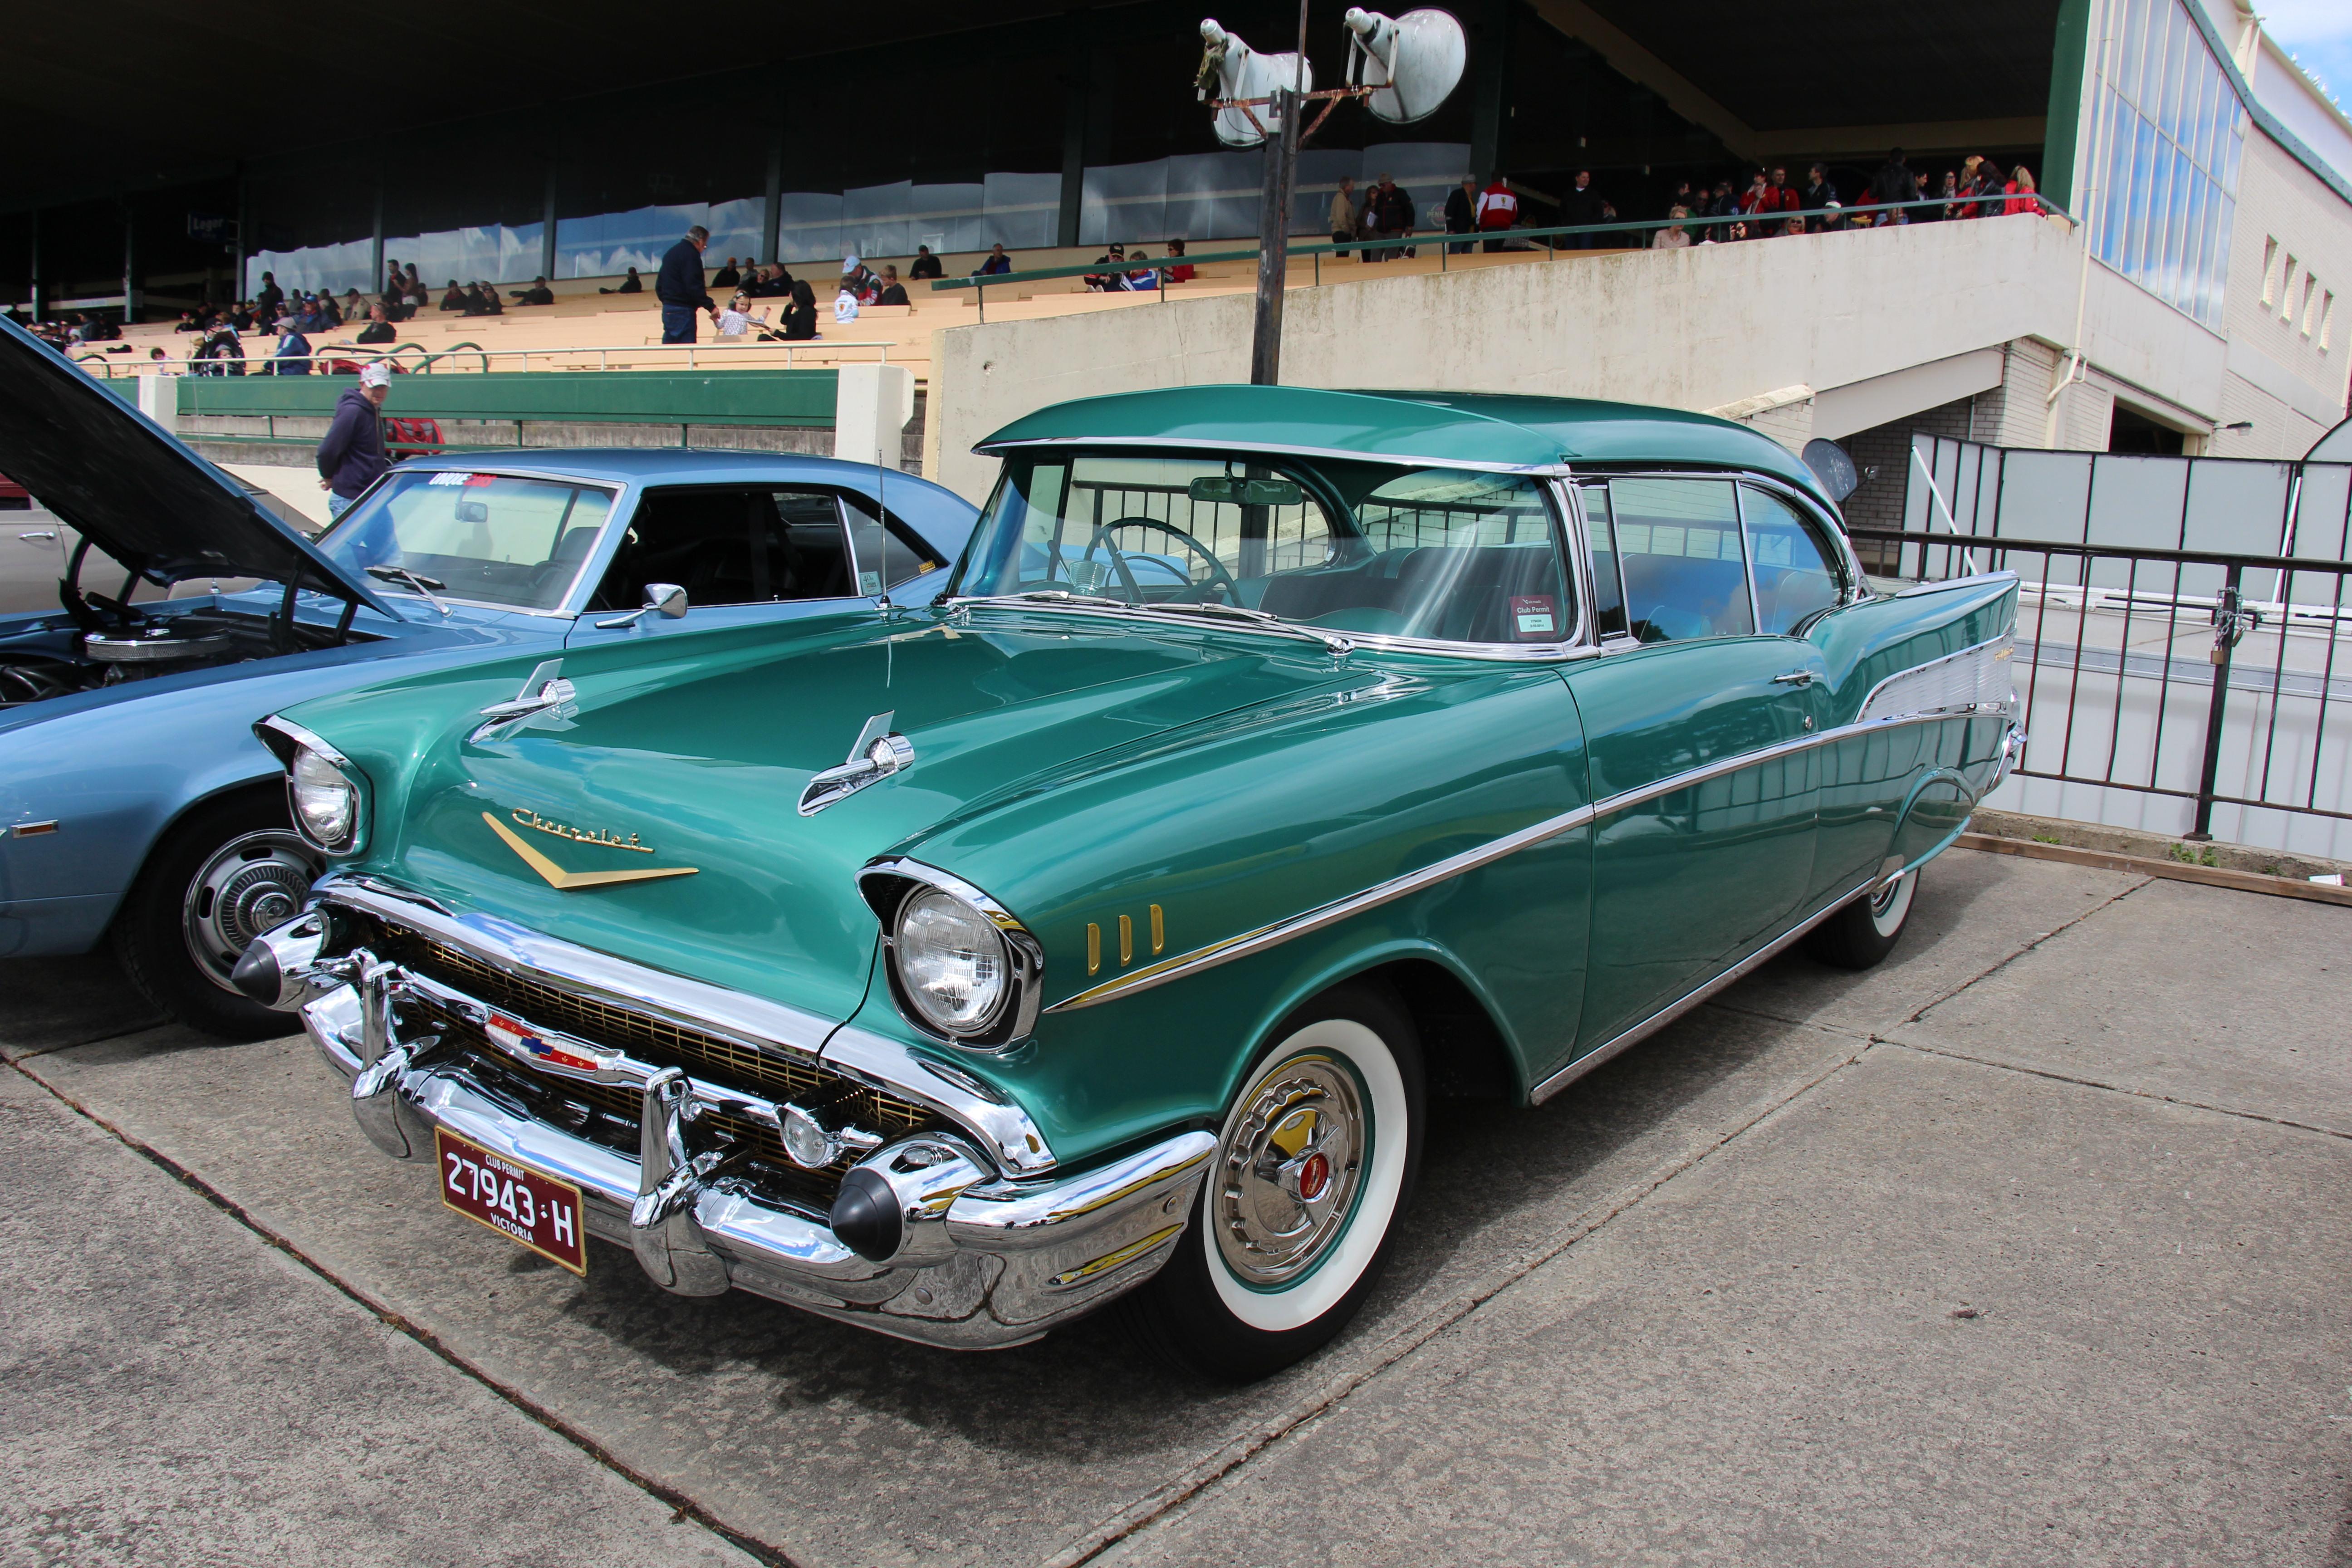 1957 Chevy 4 Door Save Our Oceans Bel Air